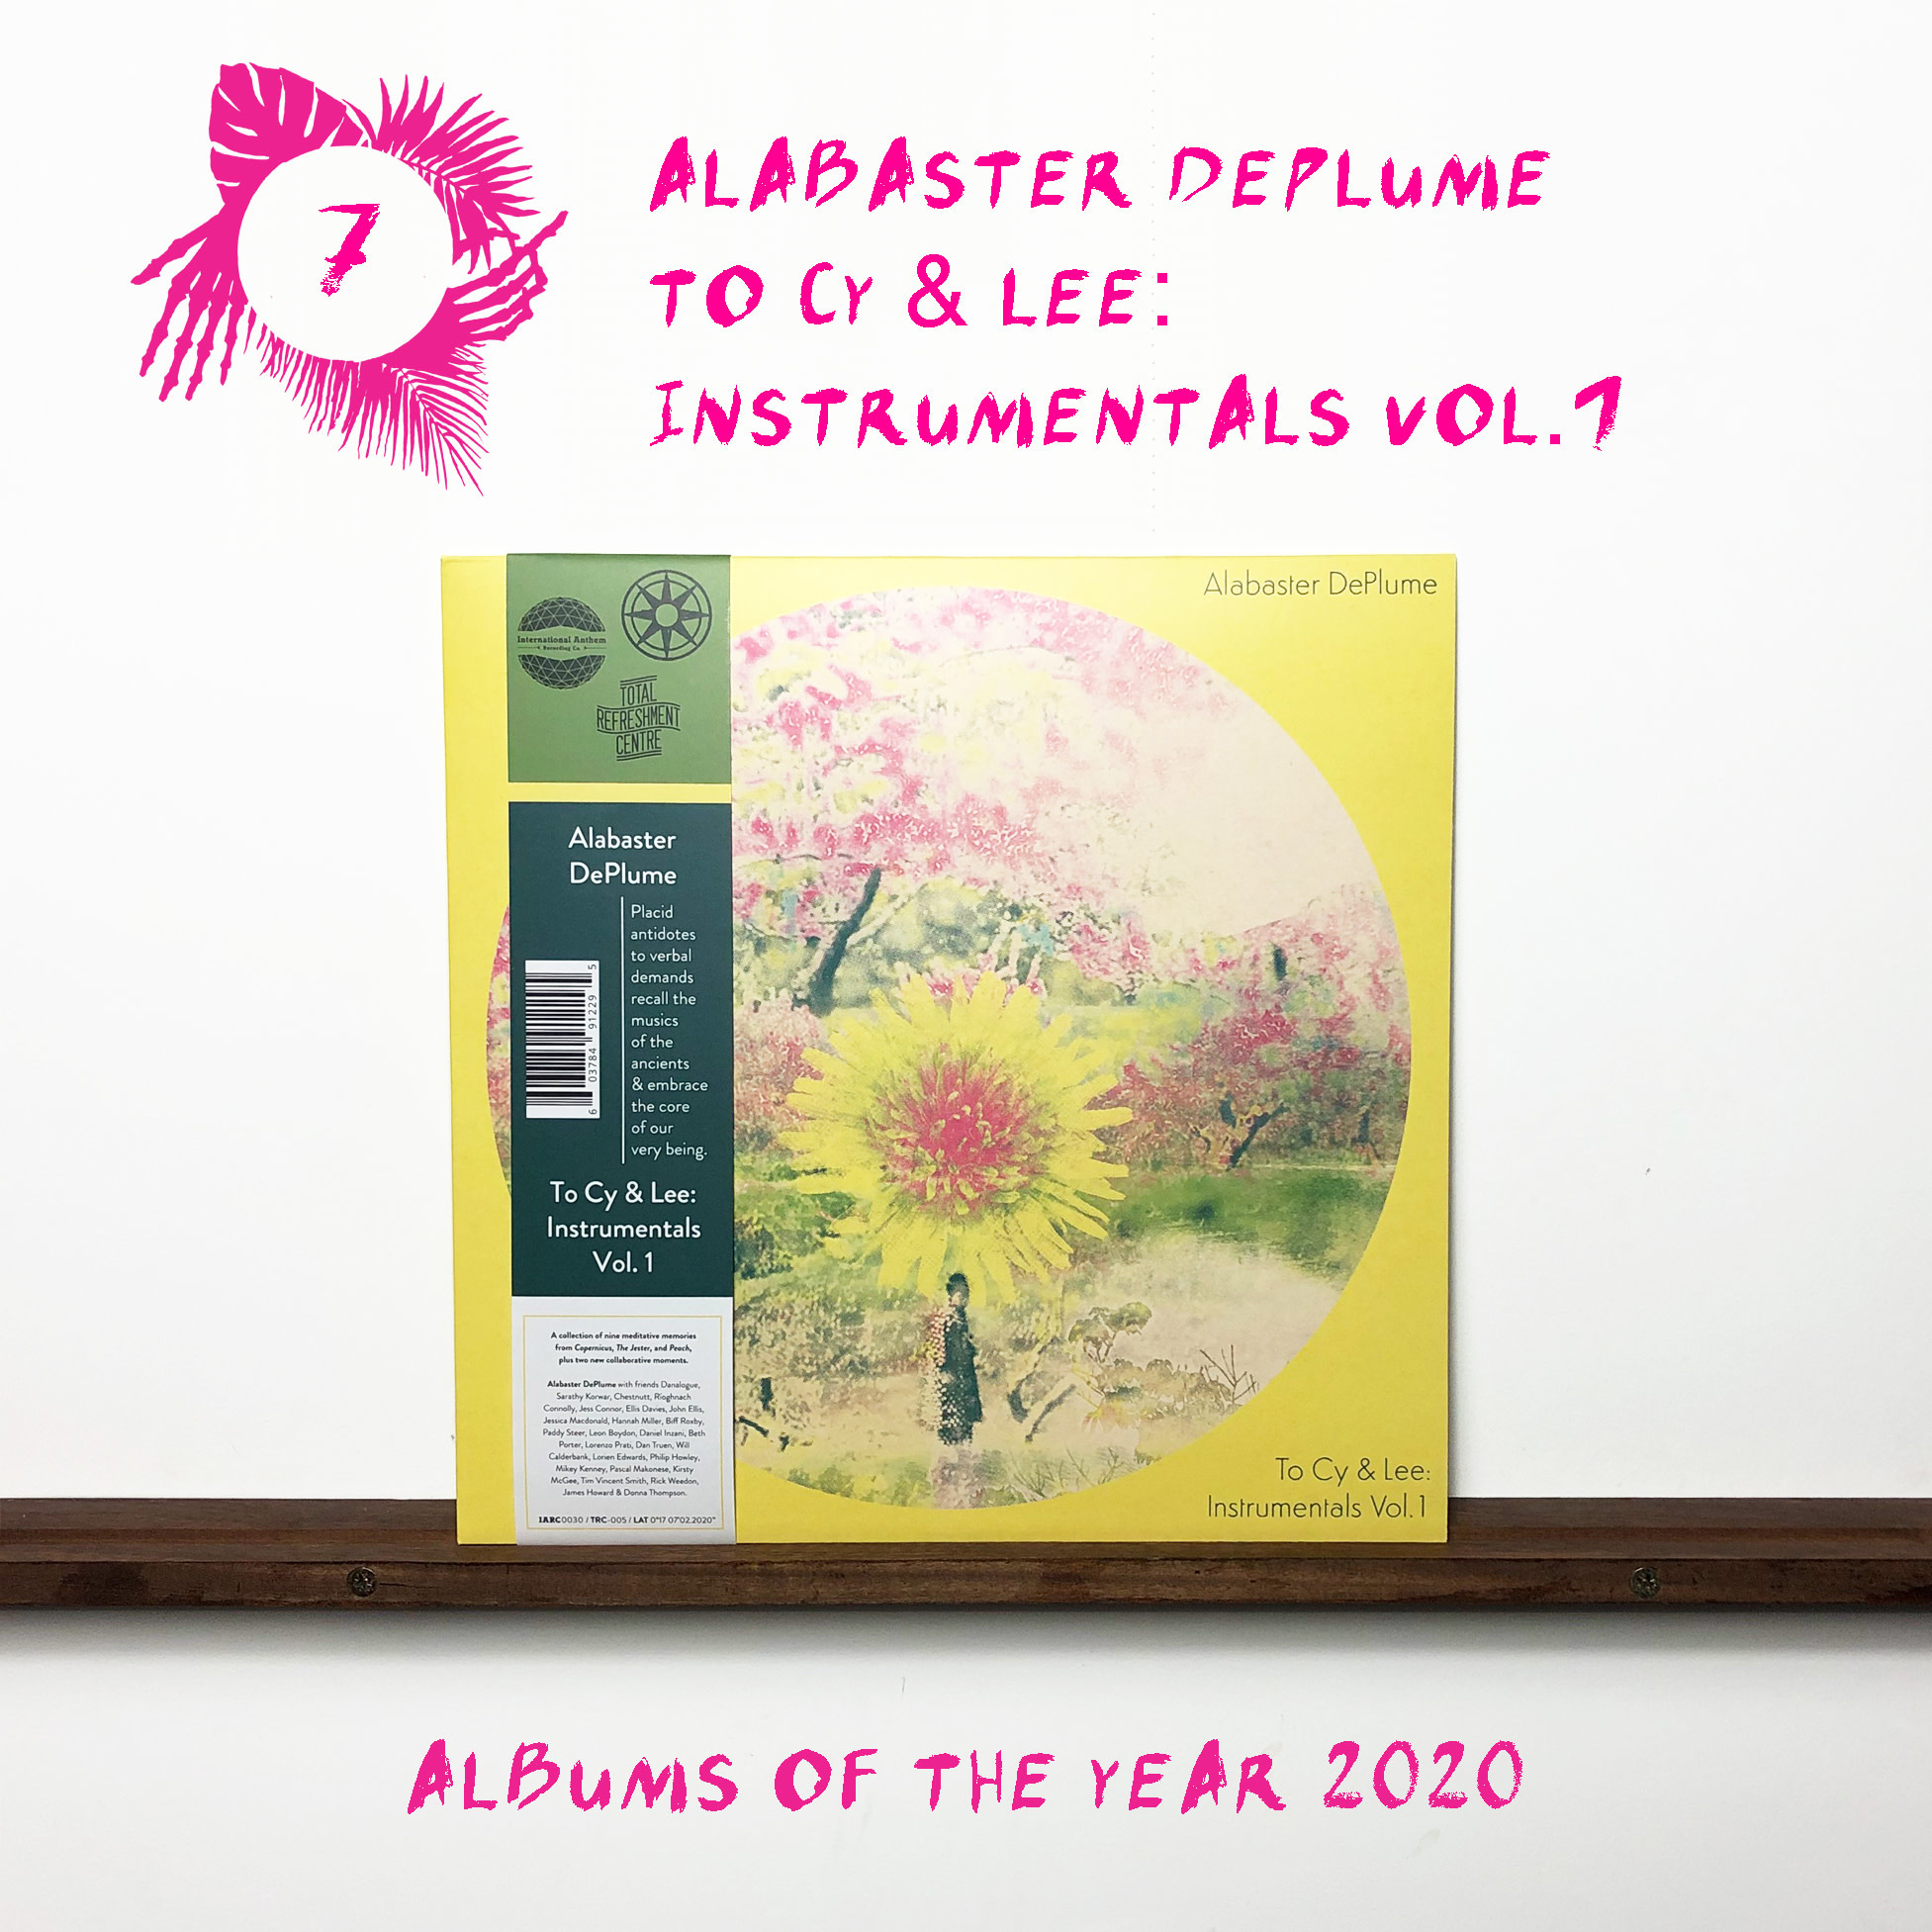 International Anthem Alabaster DePlume - To Cy & Lee: Instrumentals Vol.1